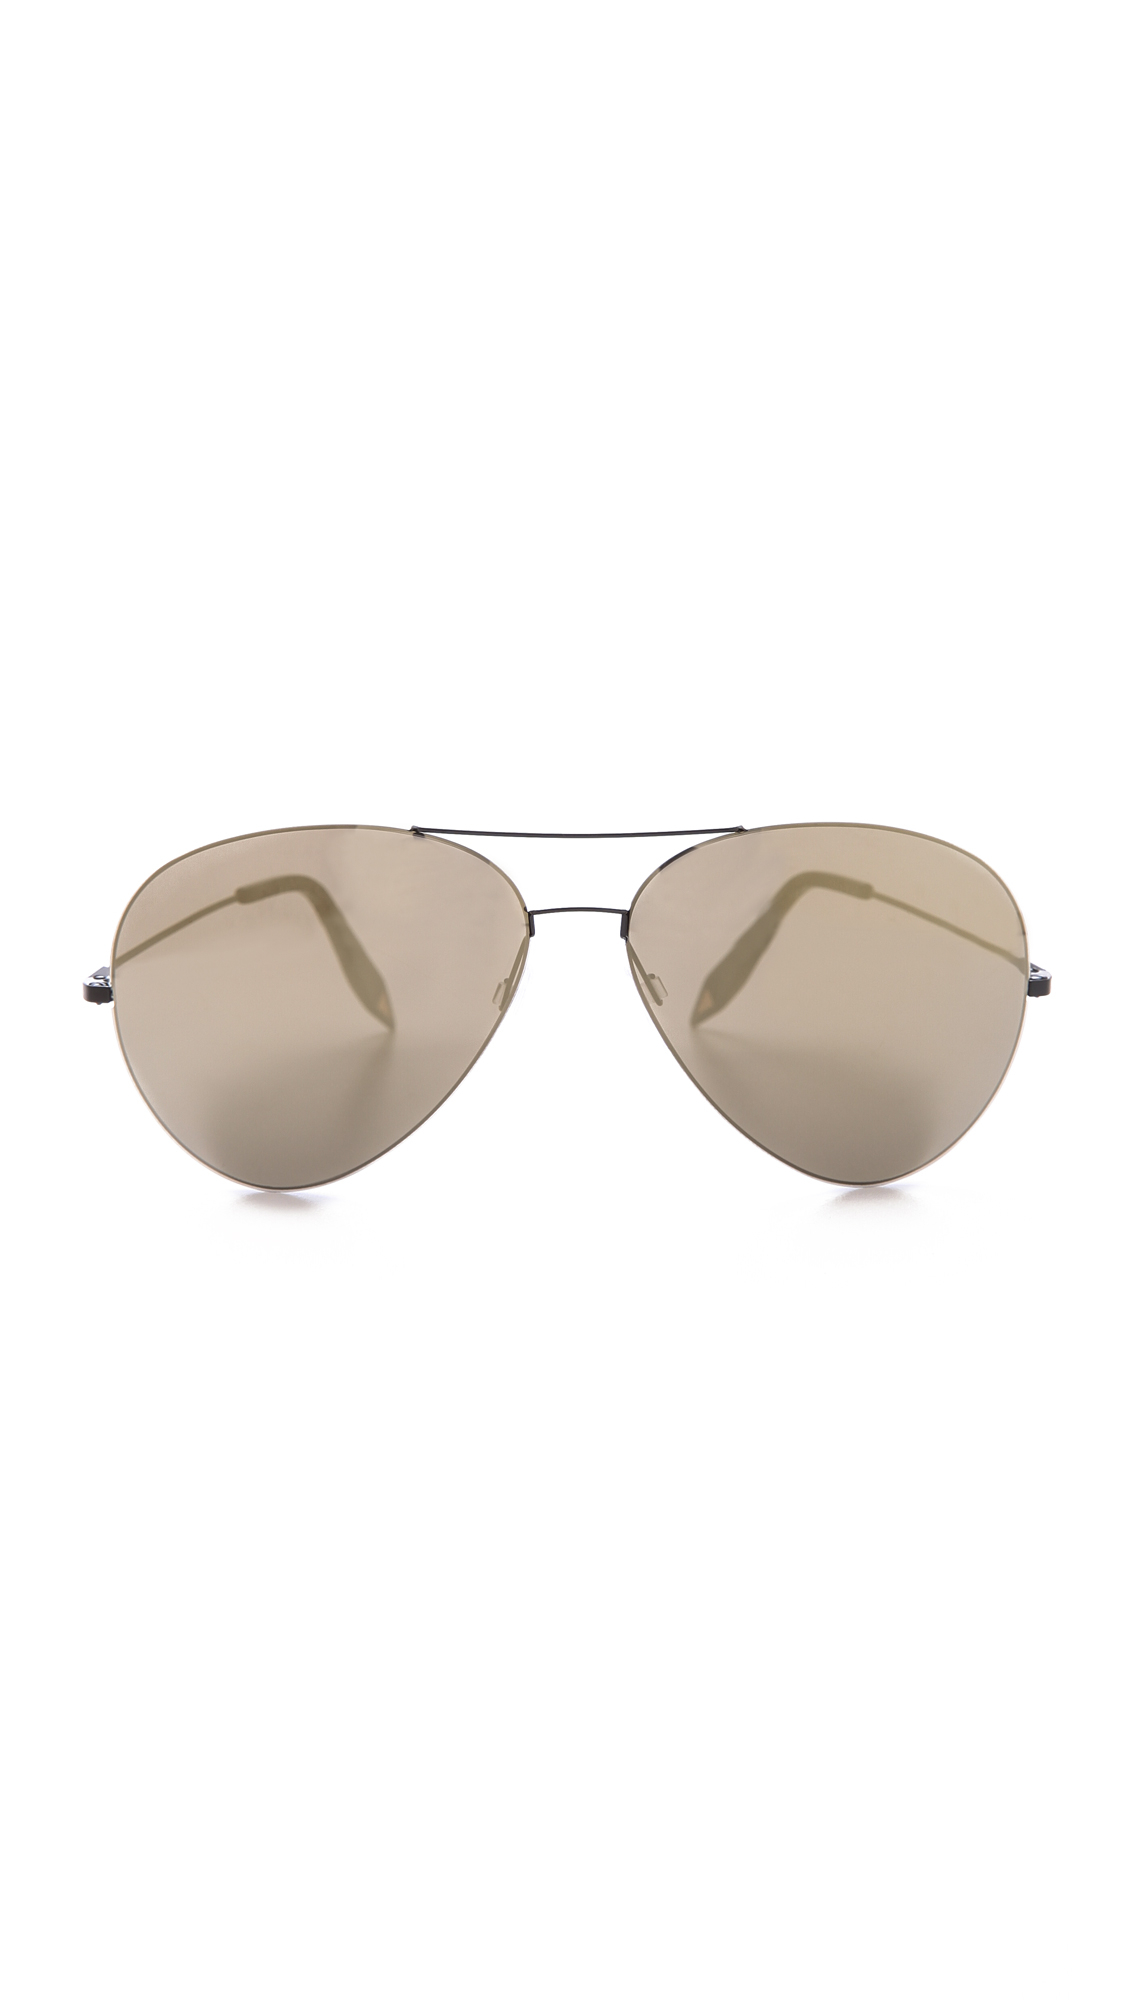 Lyst Victoria Beckham Feather Aviator Sunglasses Black